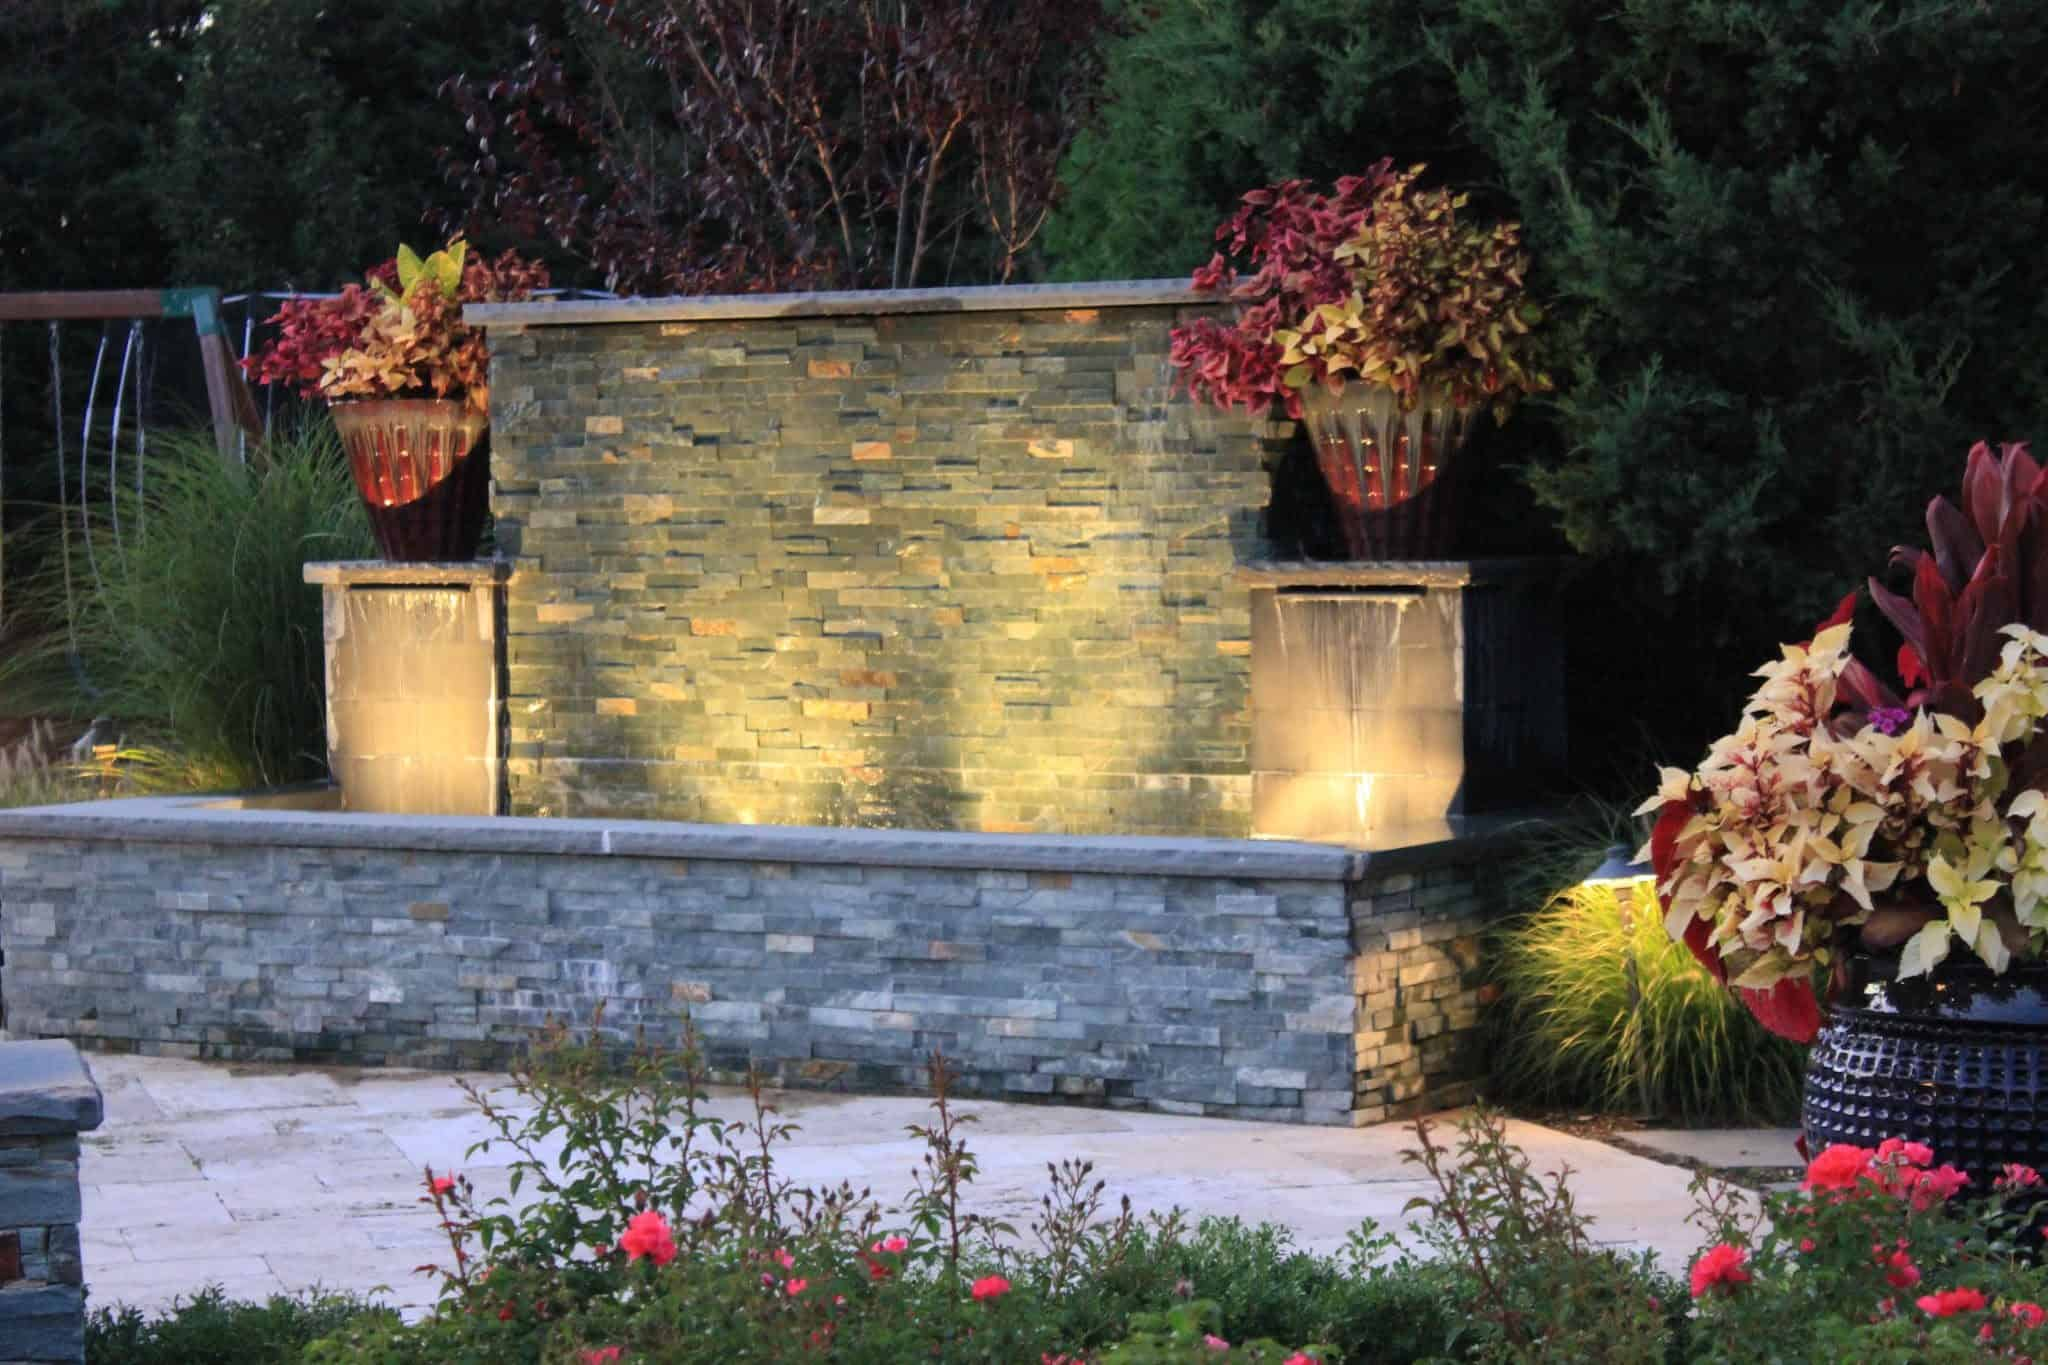 24 inch Glazed Pottery planted with Croton - Southampton, Long Island NY